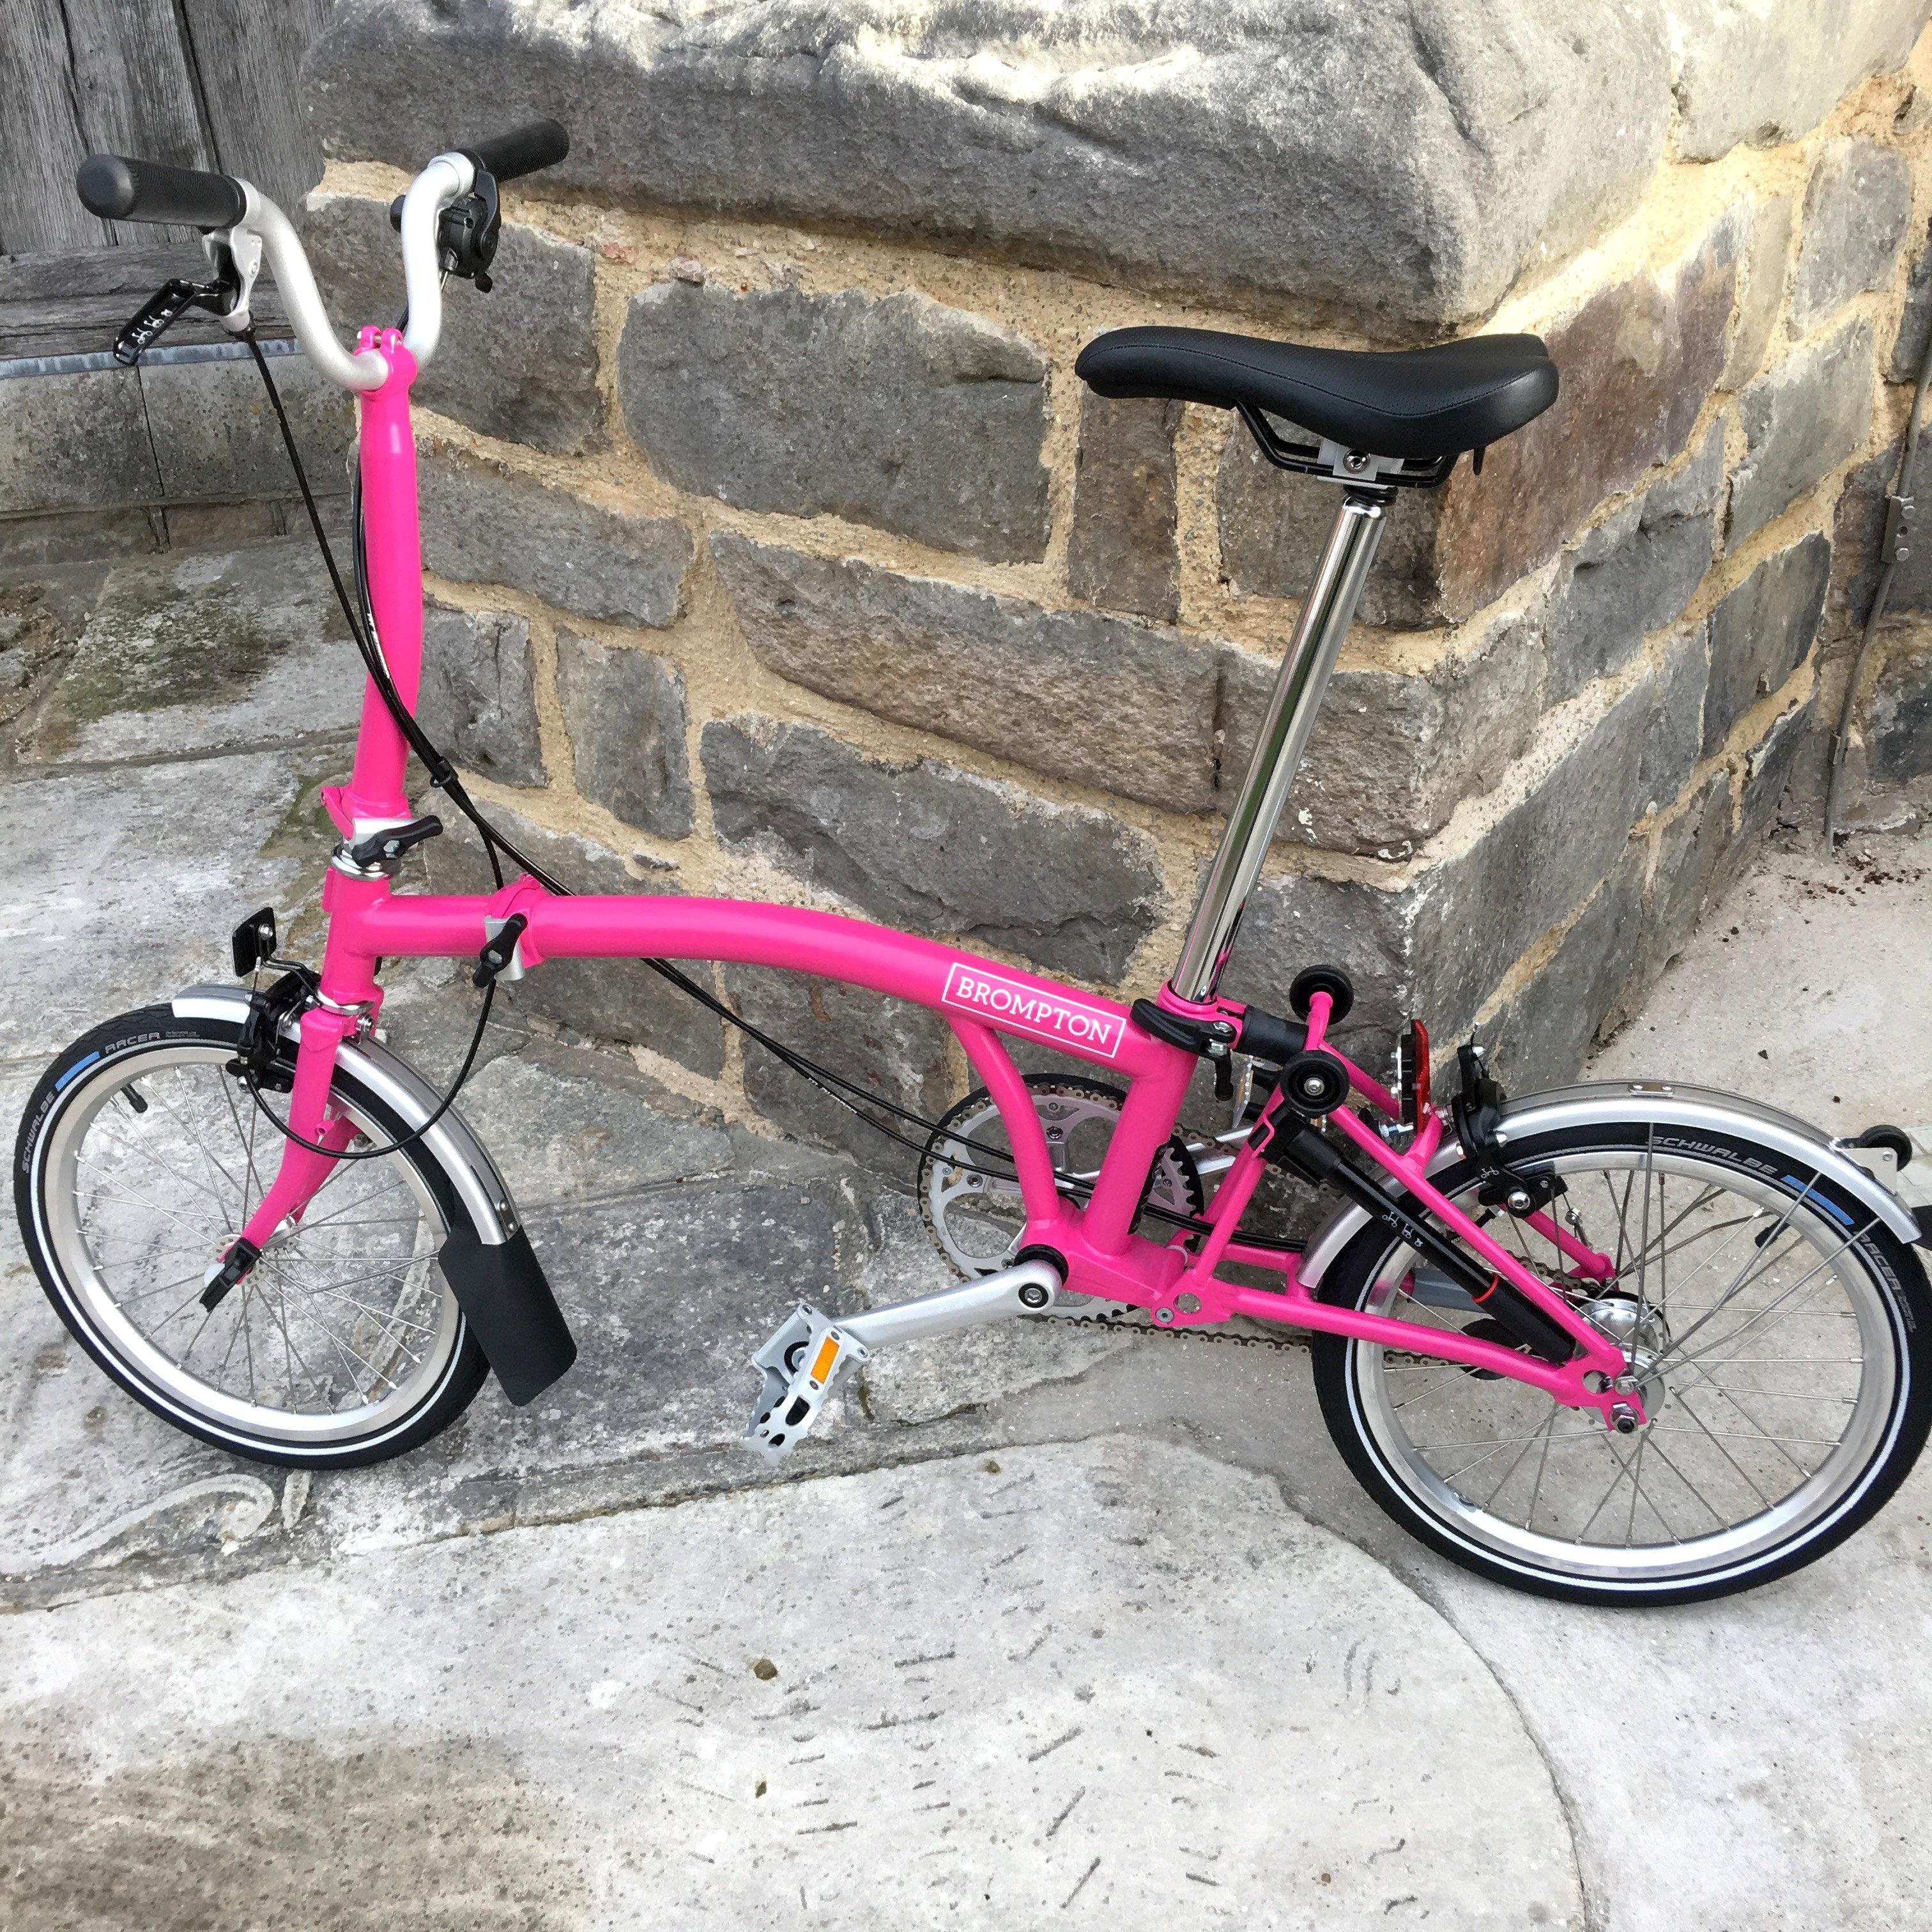 87431bcd3 Brompton Hot Pink M3L folding bike - 2019 model